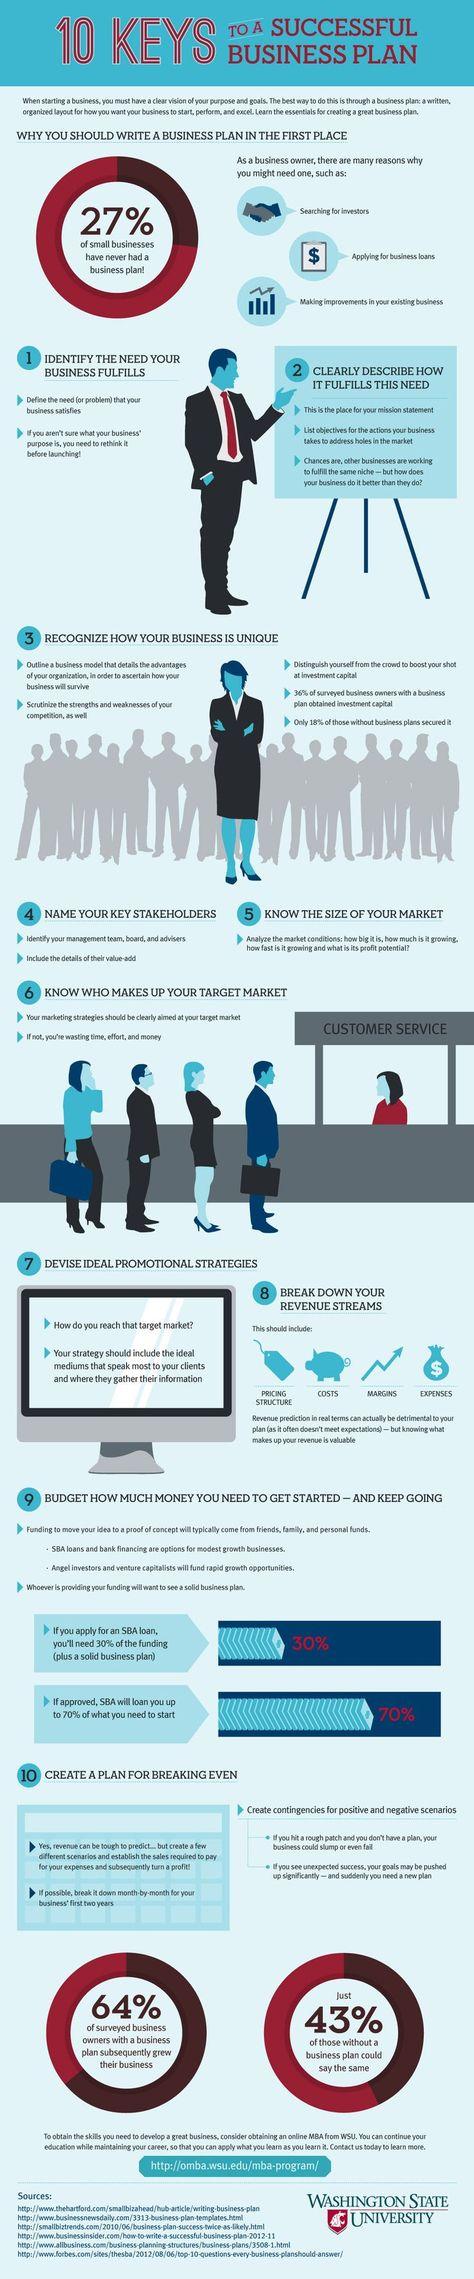 How Do I Build a Business Plan? (Infographic)